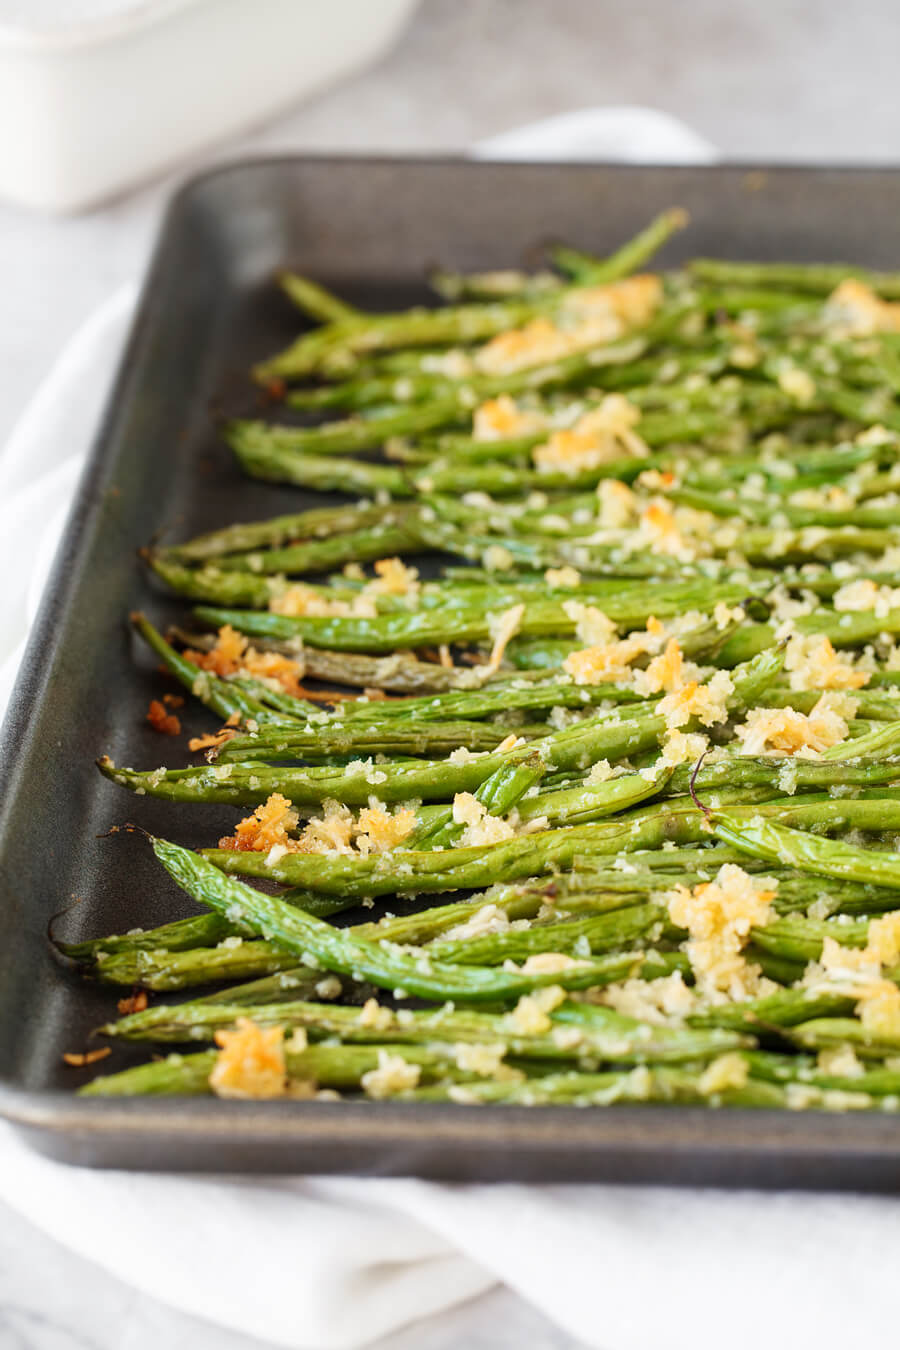 #12 Roasted Vegetable Bowls